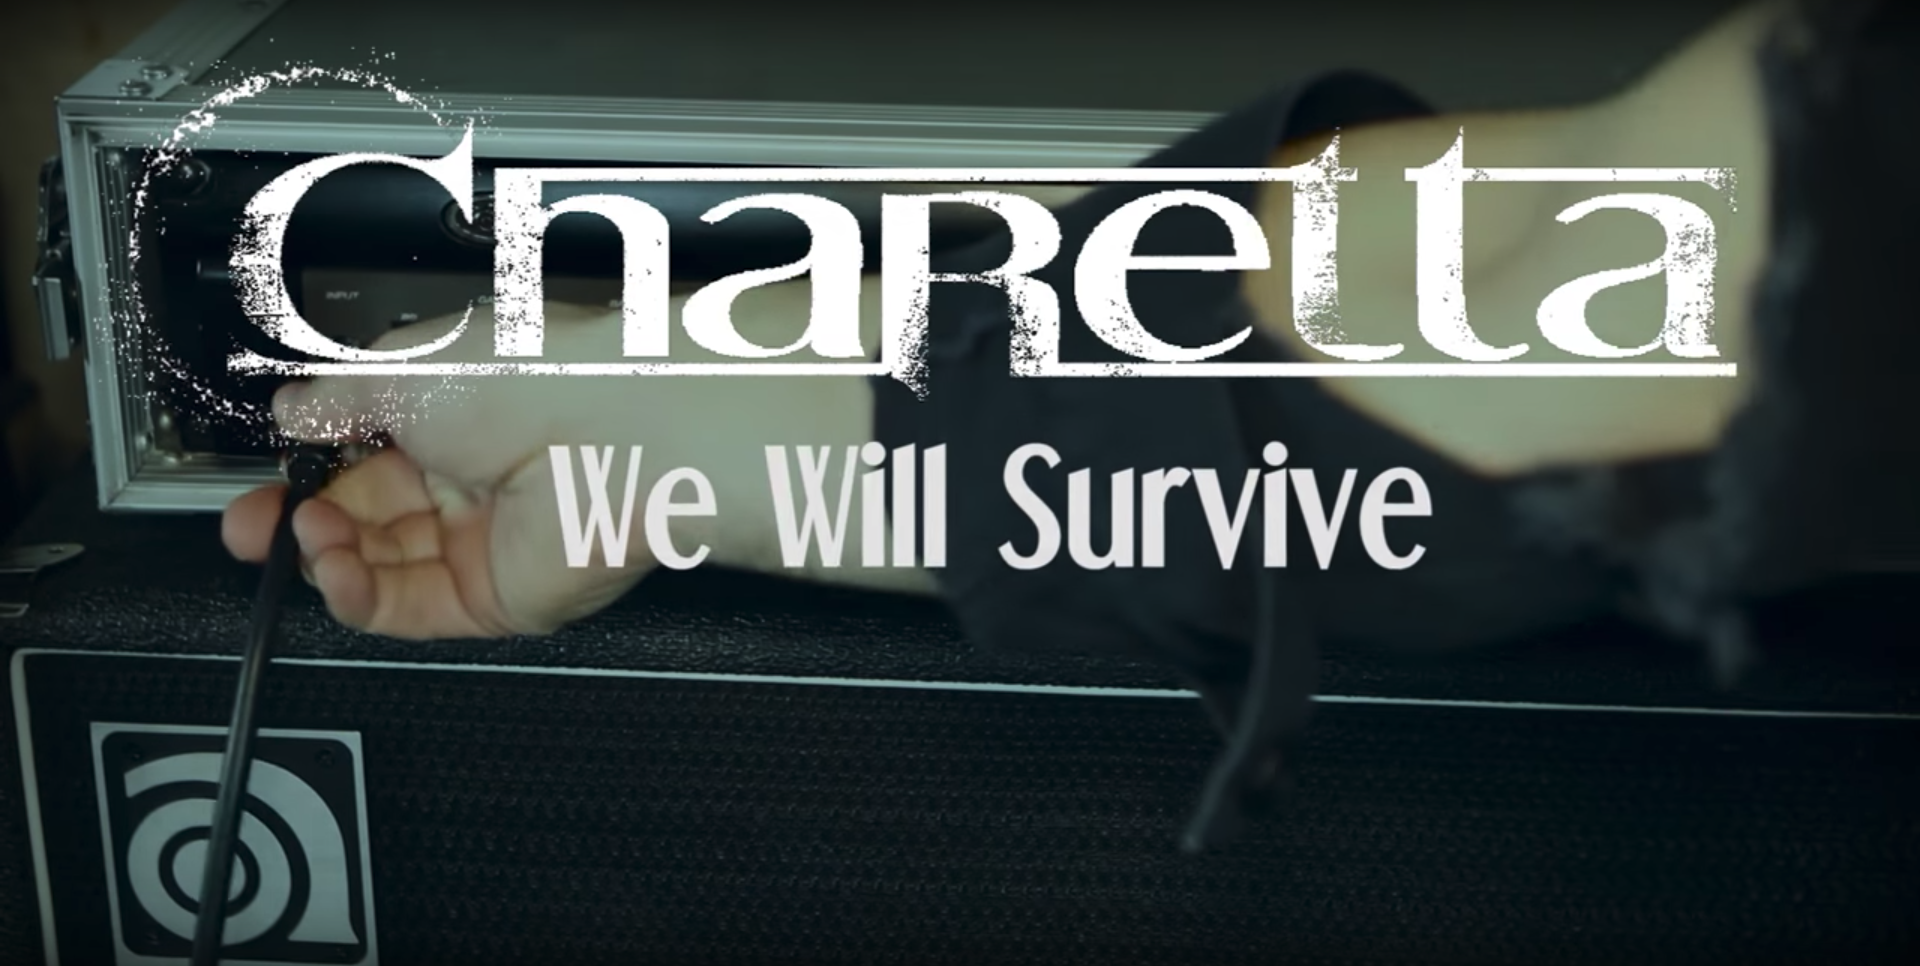 Charetta: We Will Survive